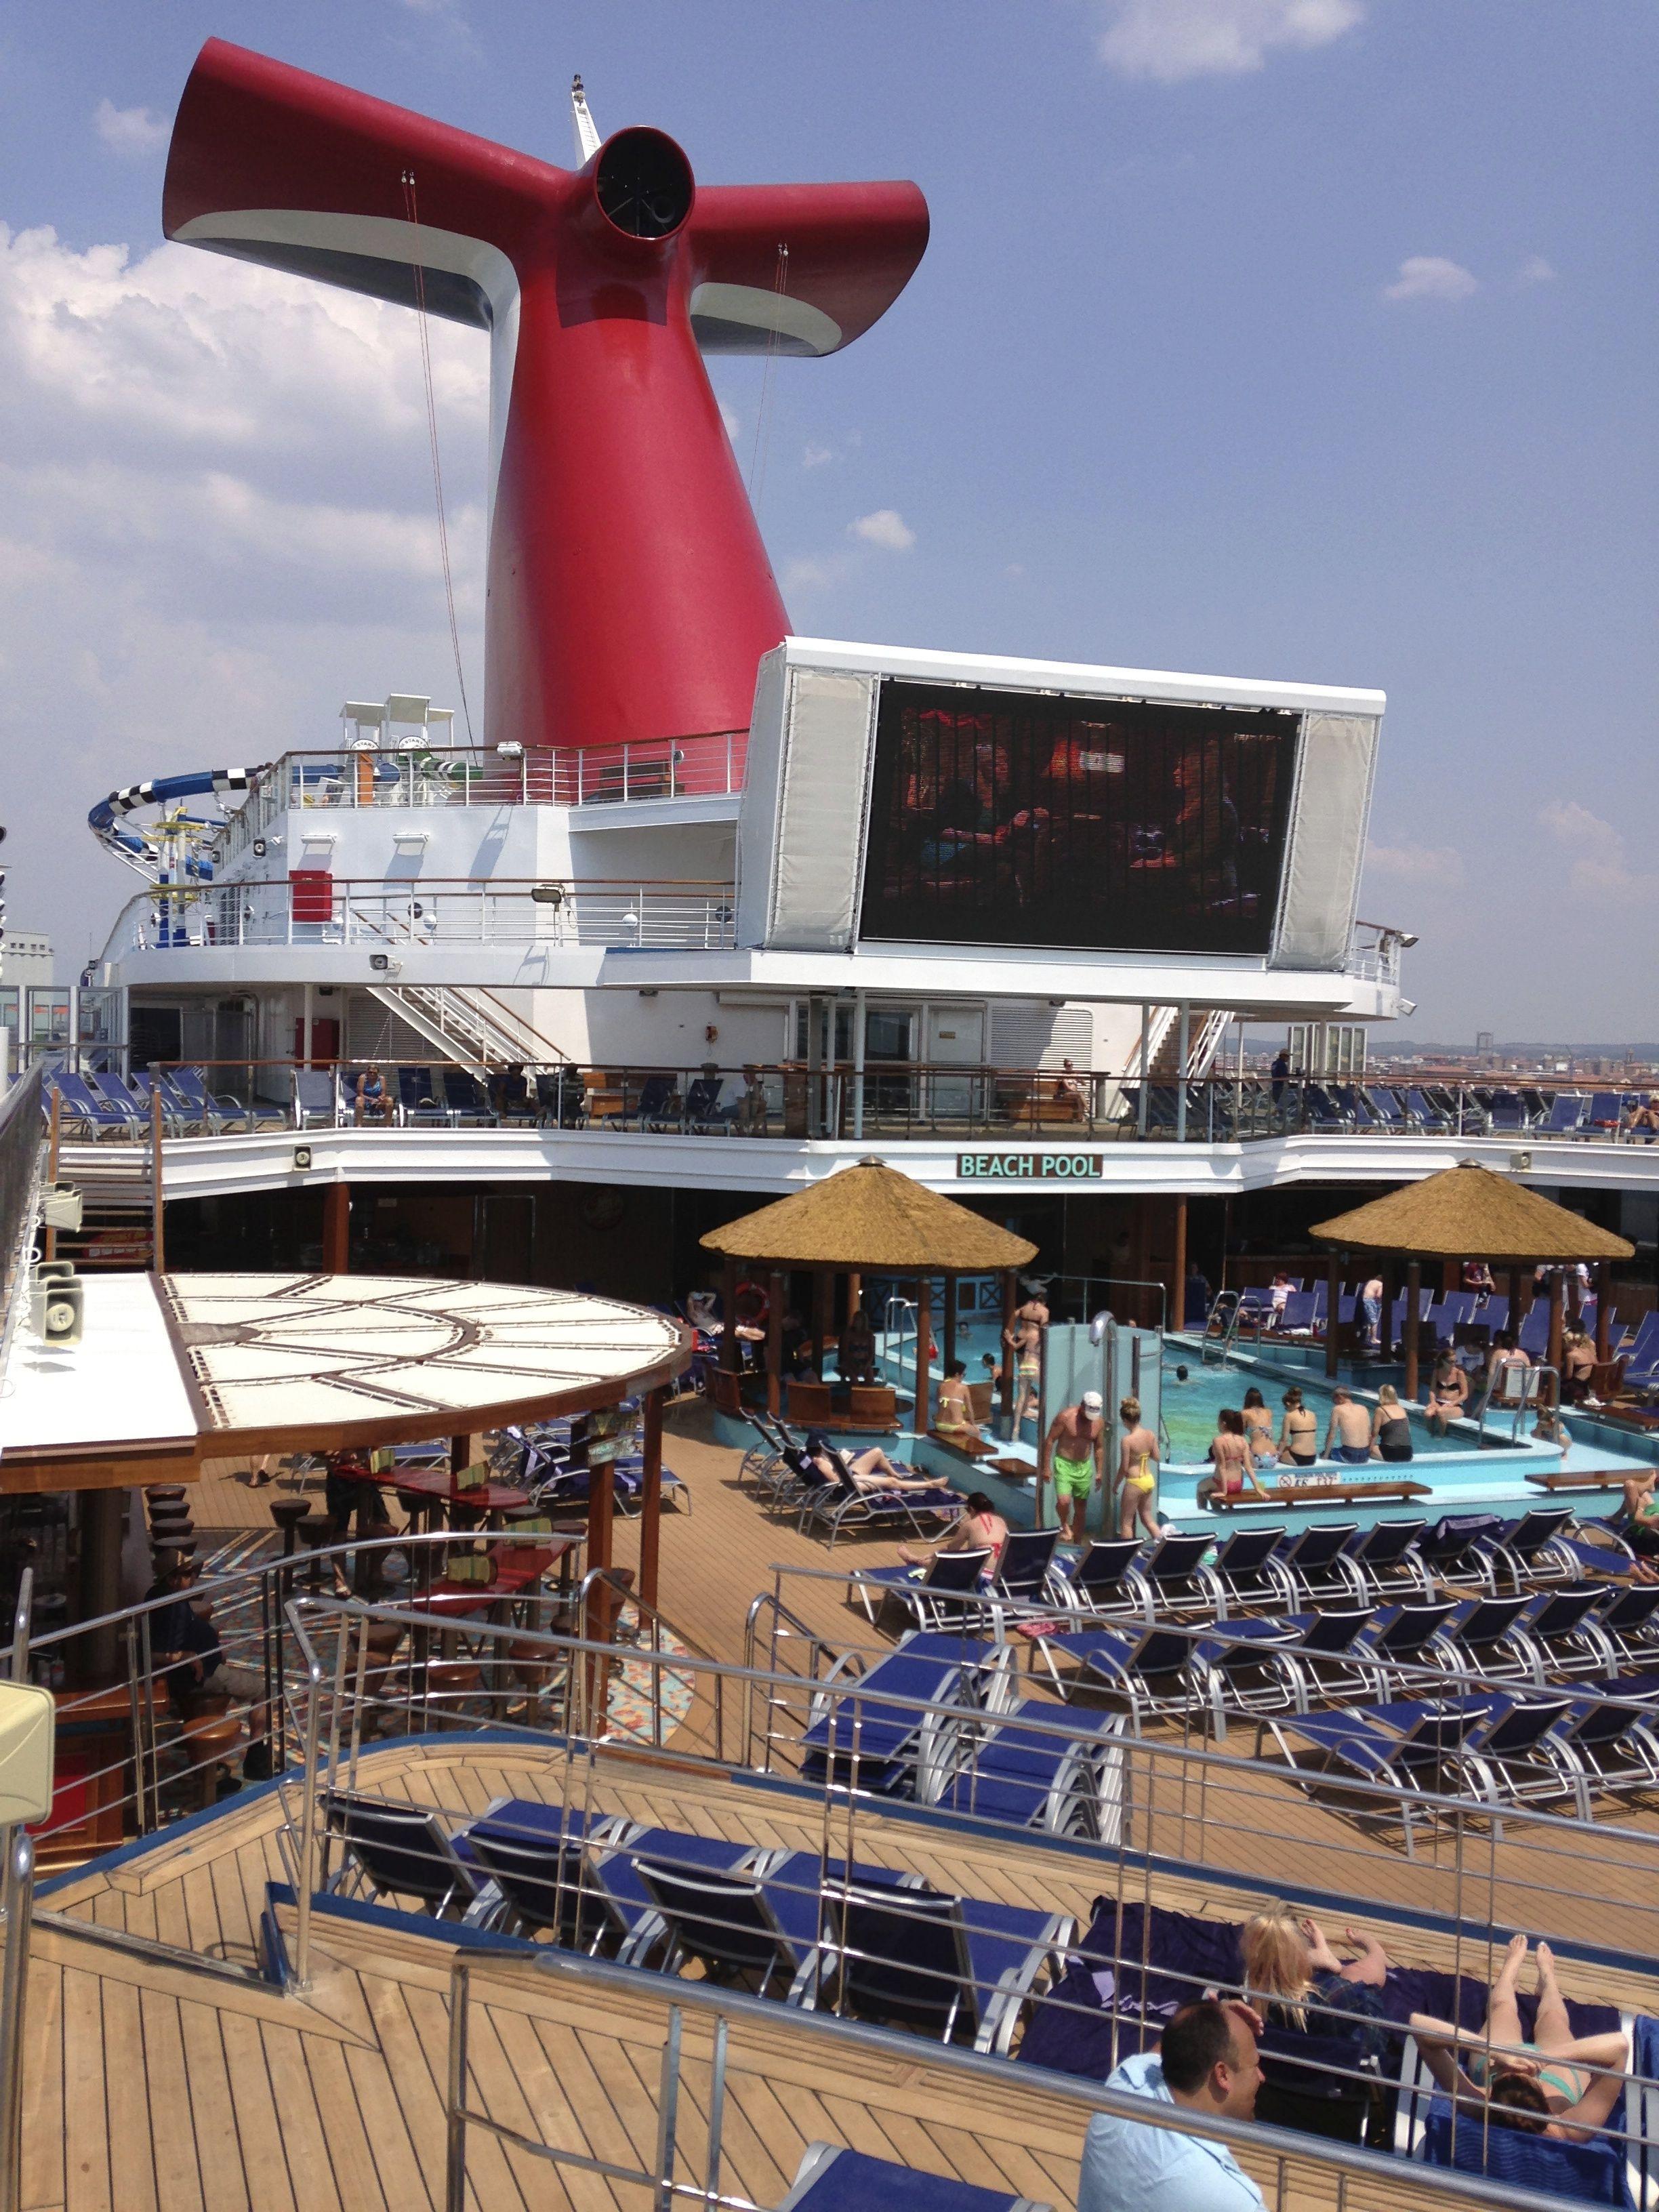 Carnival Sunshine Cruise Ship Review Audio Podcast Carnival - Cruise ship reviews